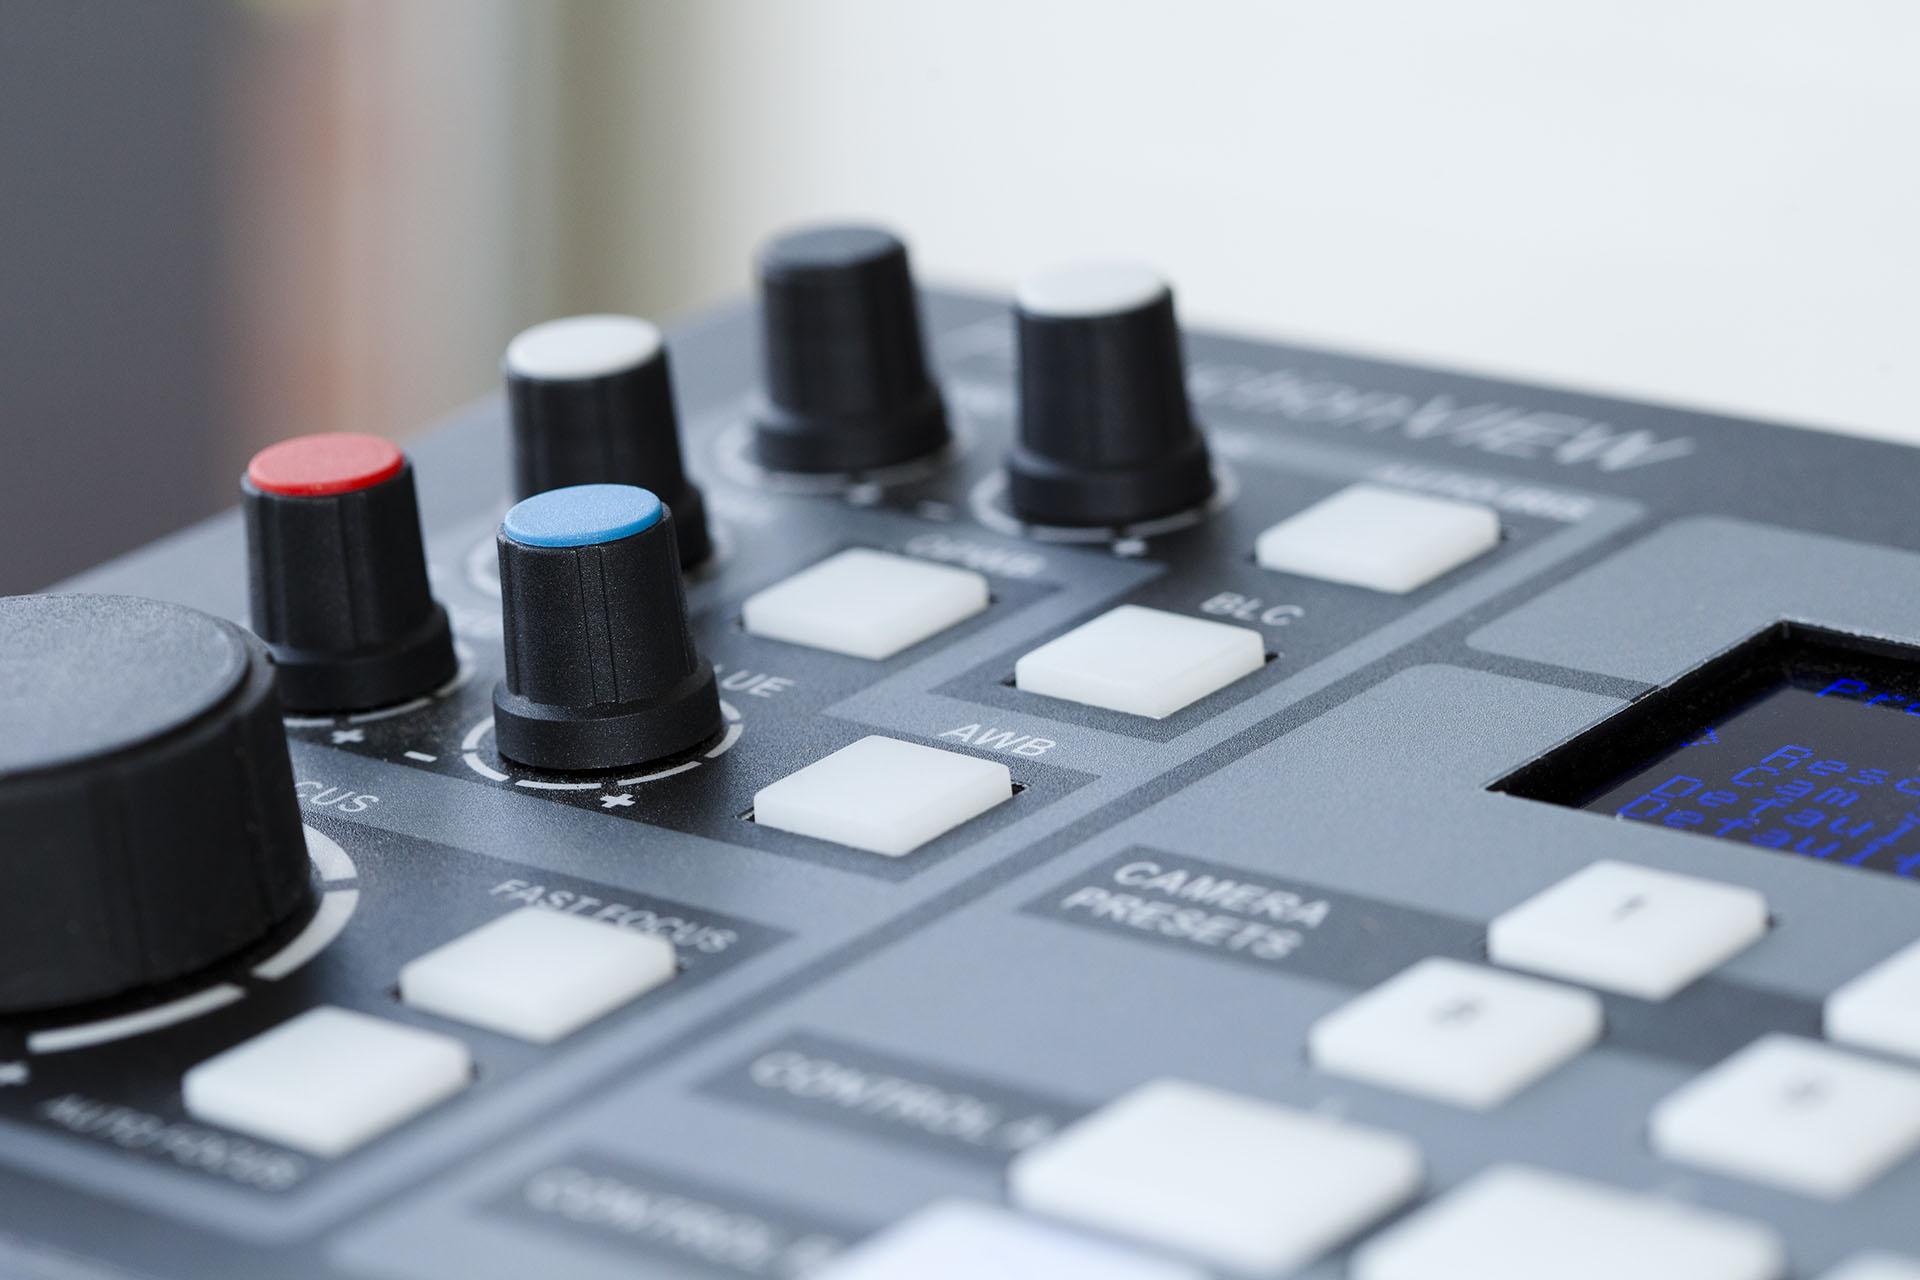 Equipos Audiovisuales Xegmenta